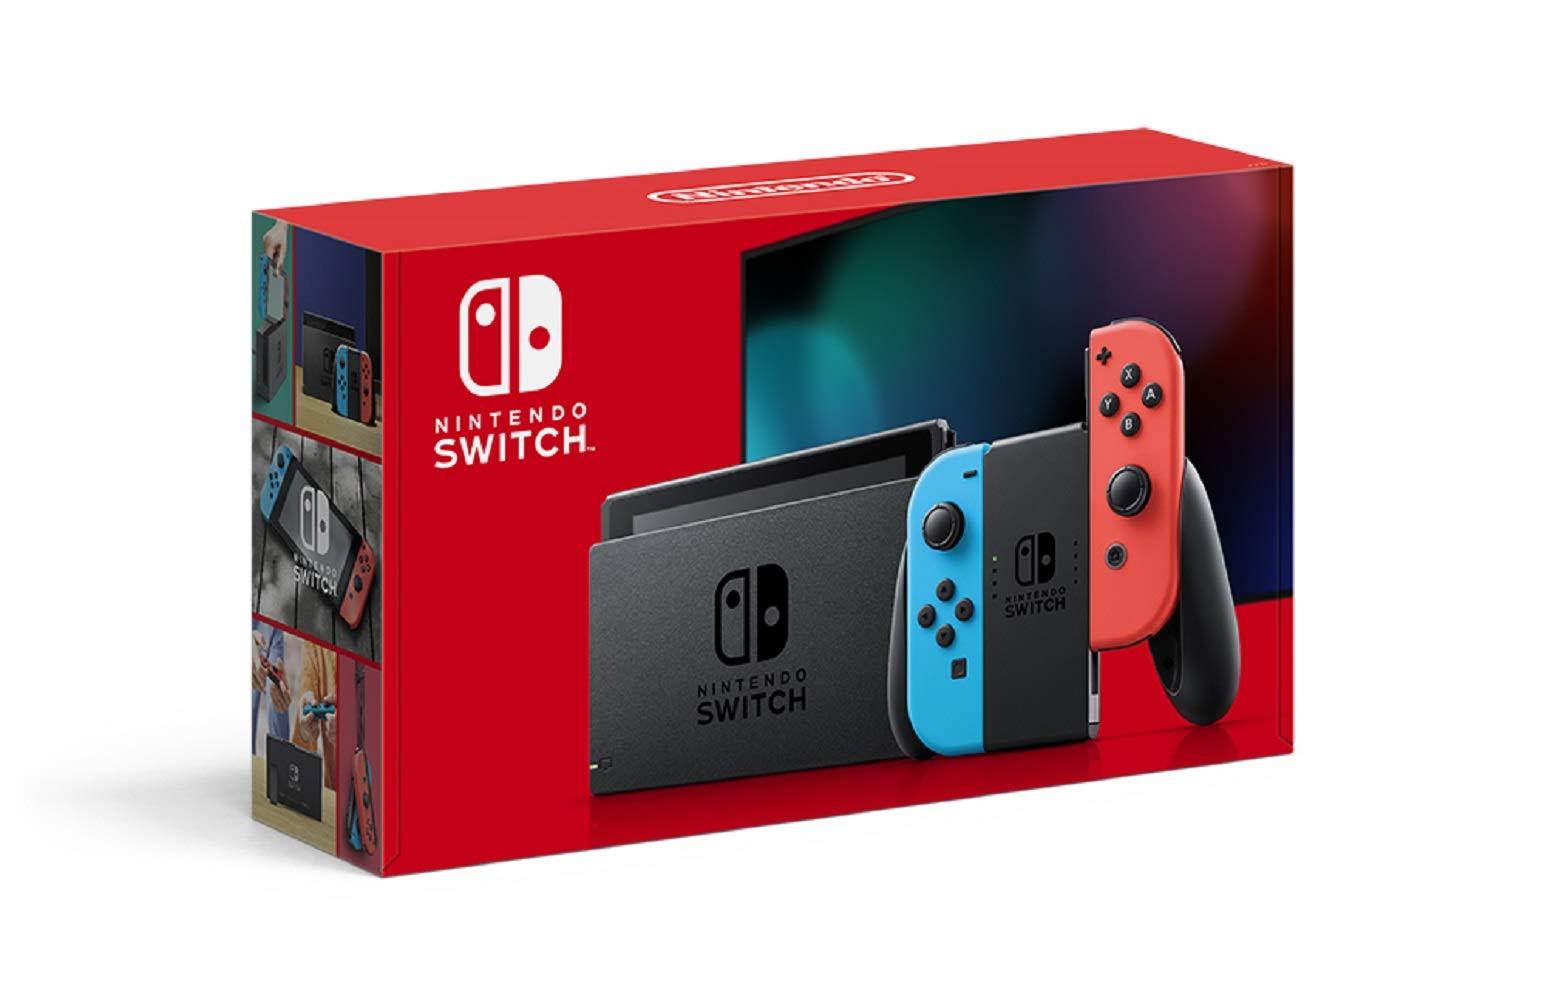 『Nintendo Switch ネオンブルー・ネオンレッド』『Nintendo Switch グレー』の抽選販売【Nintendo TOKYO】